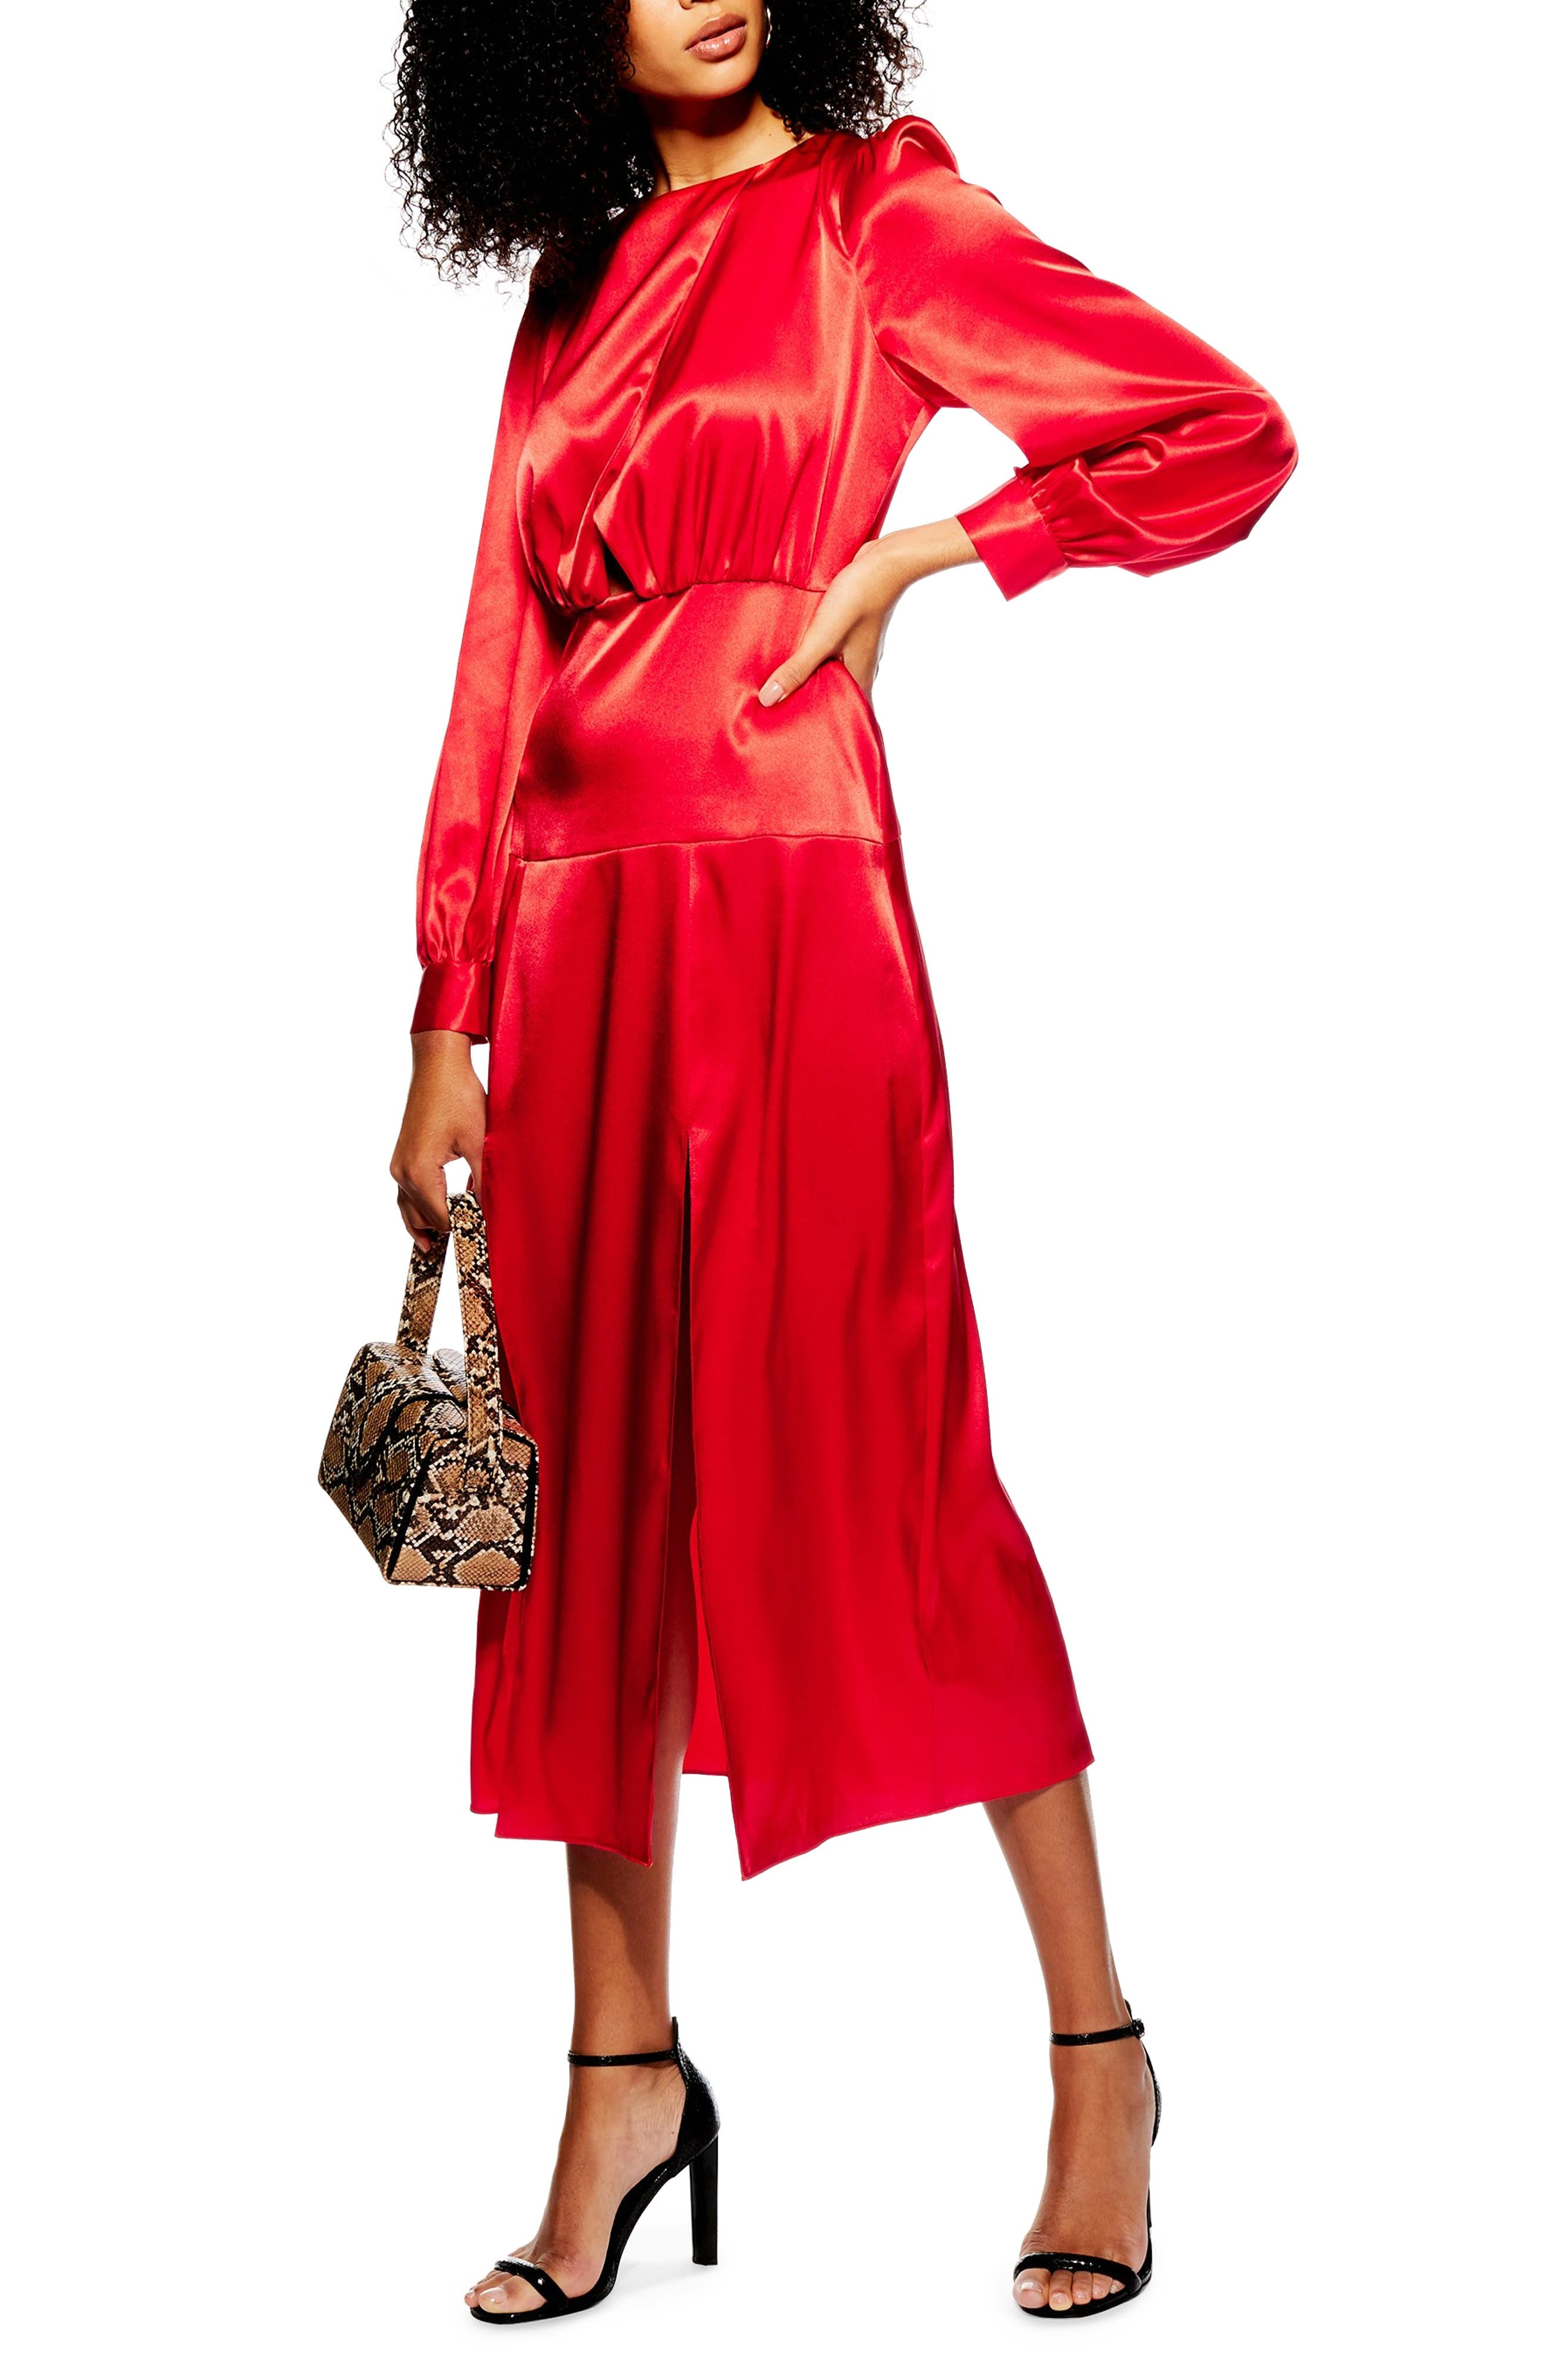 Topshop Cutout Midi Dress, US (fits like 0-2) - Red